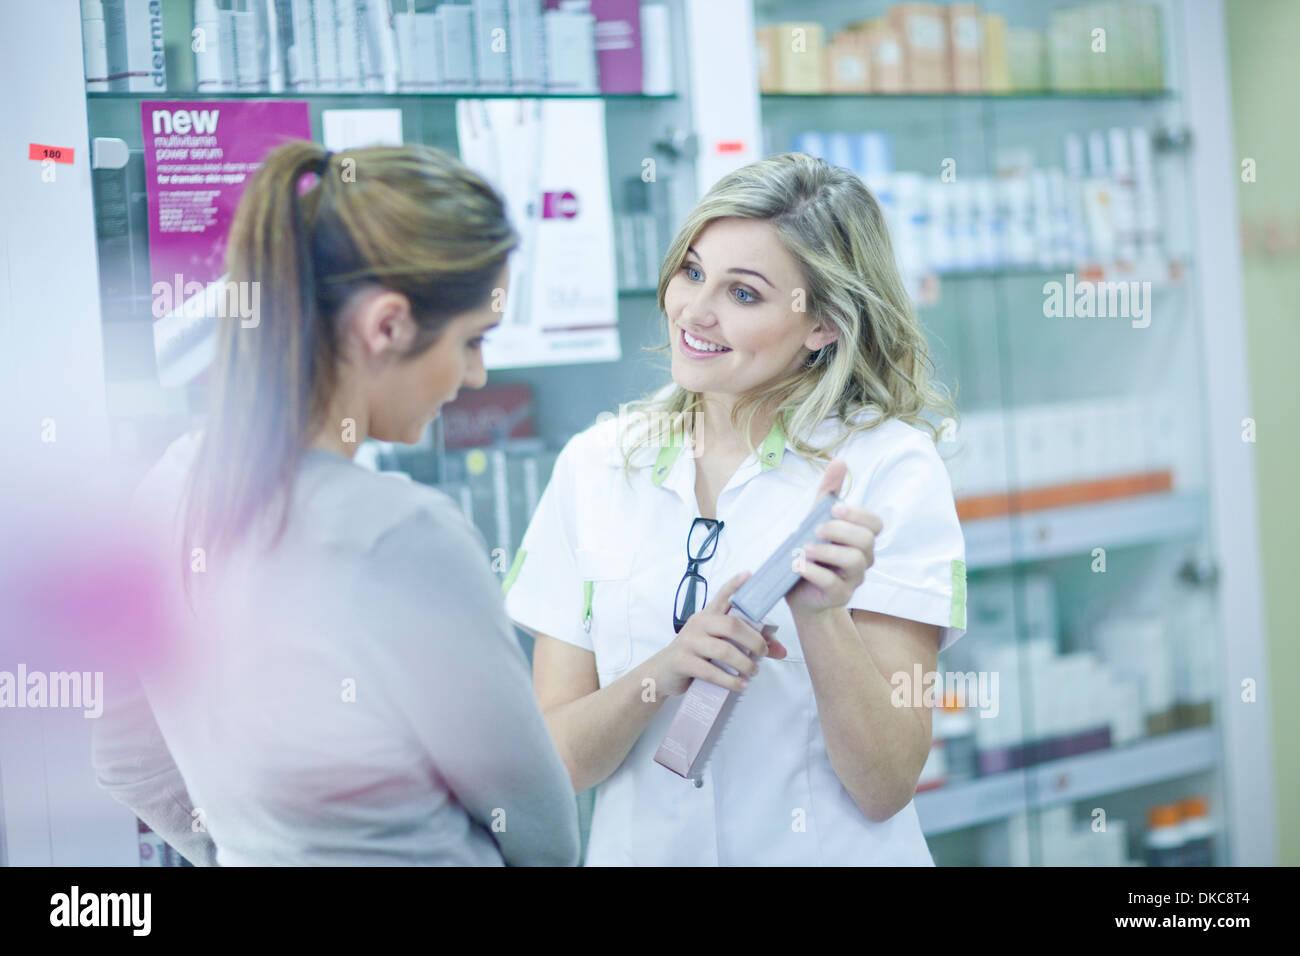 Pharmacist showing customer box of medication - Stock Image